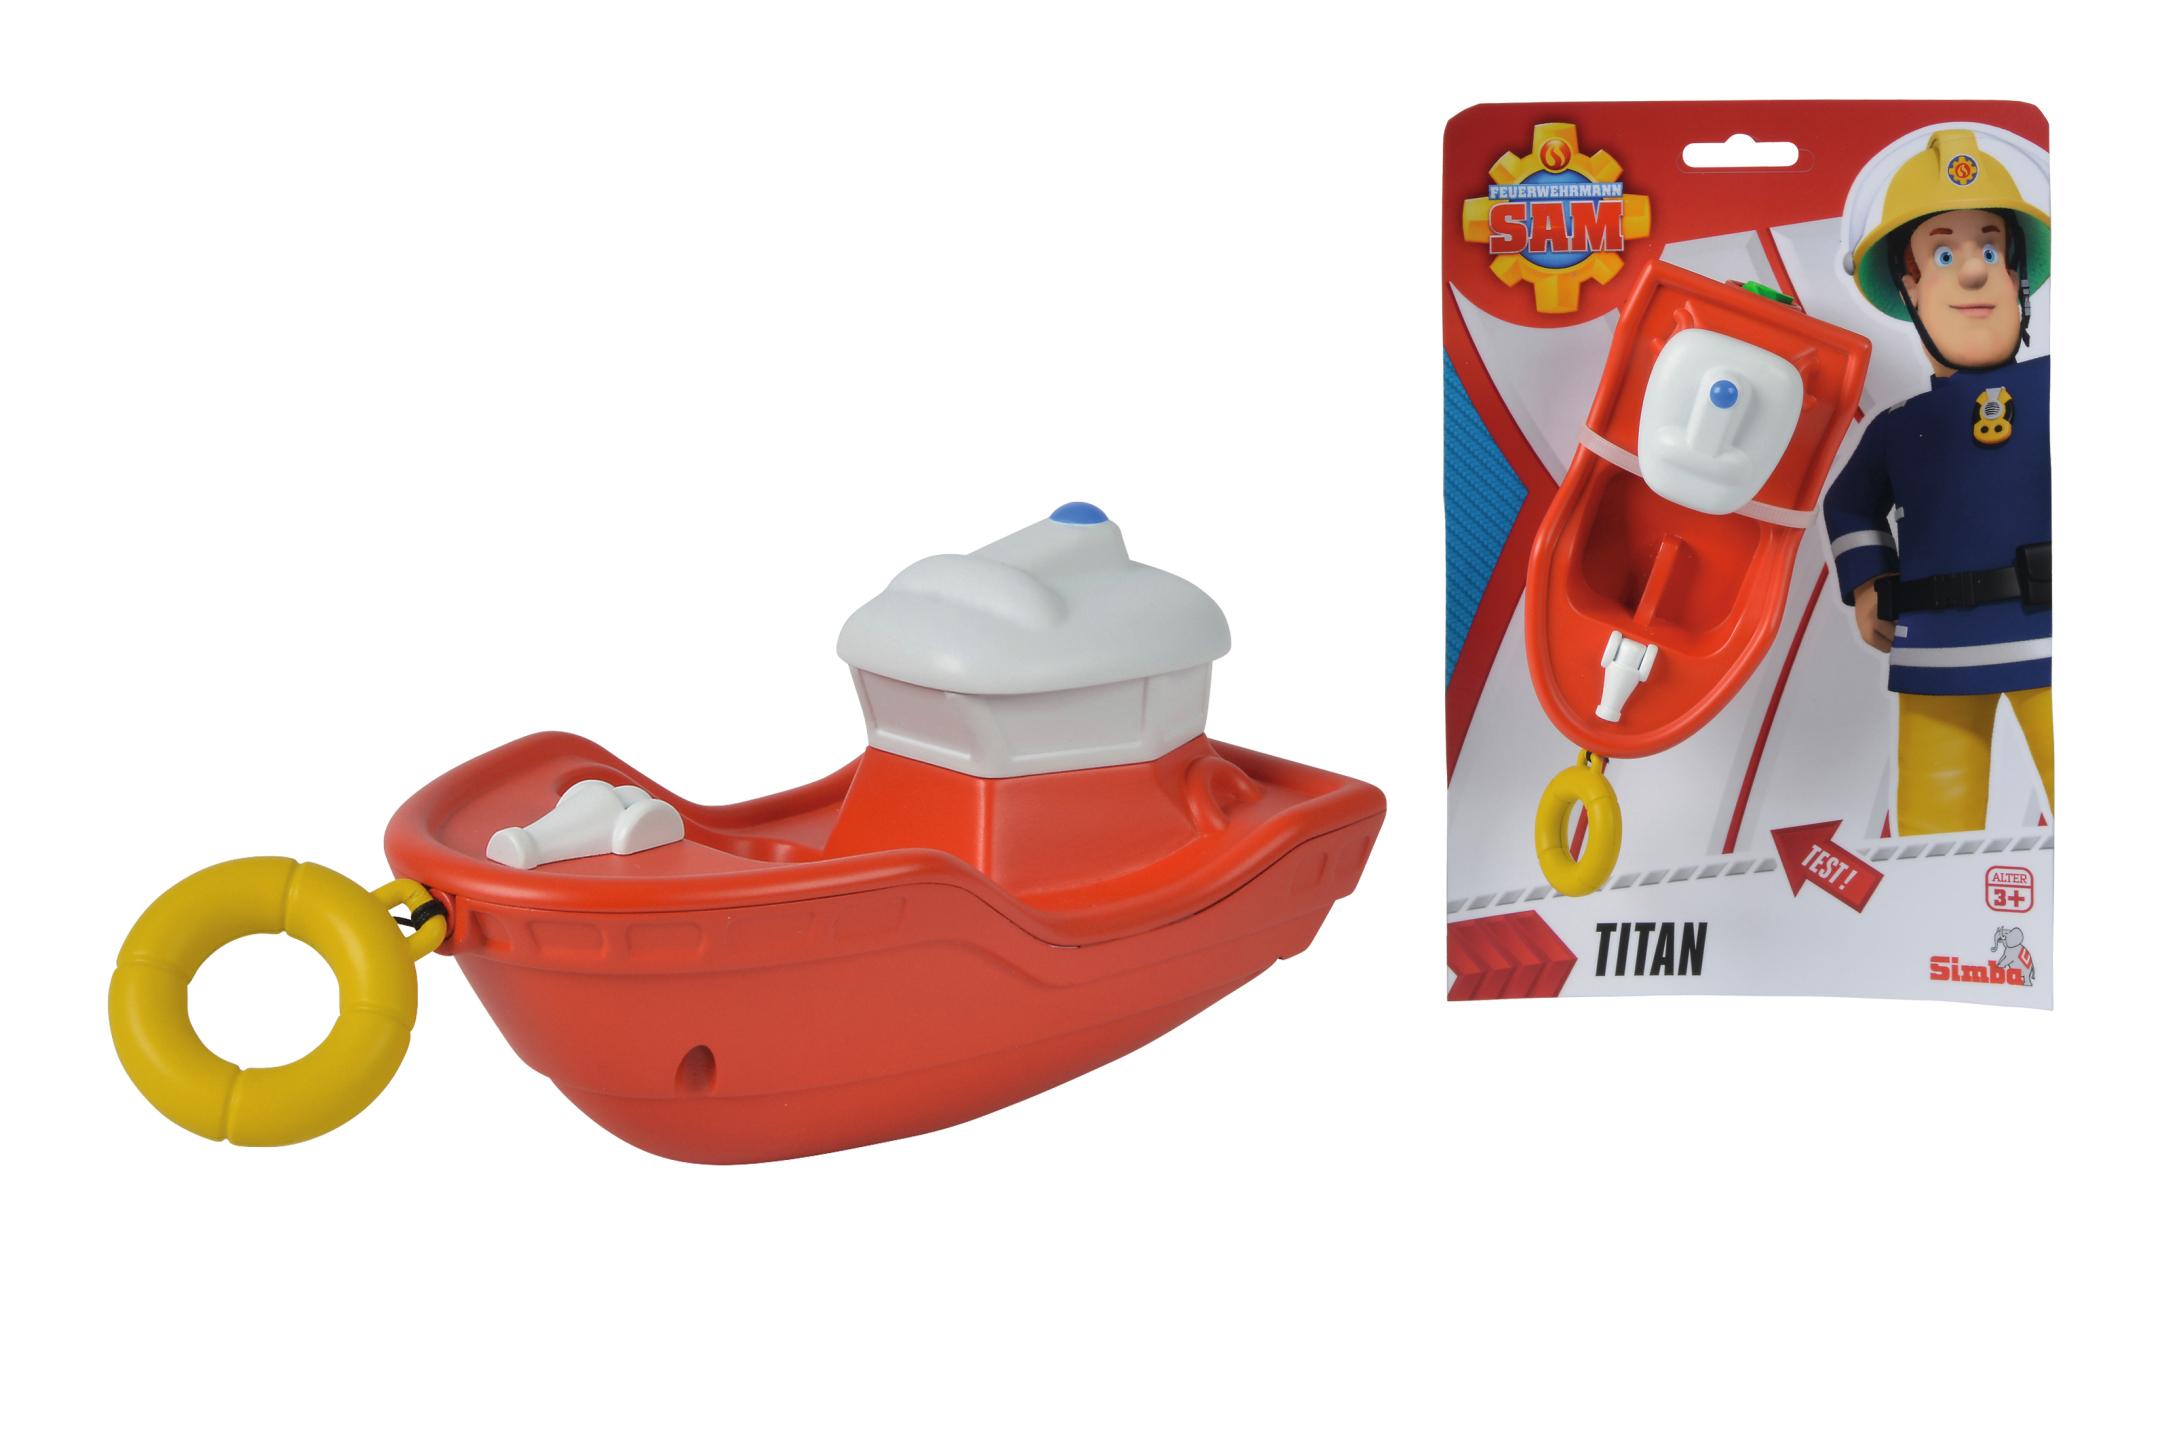 Fireman Sam Aufzieh-Boot Titan